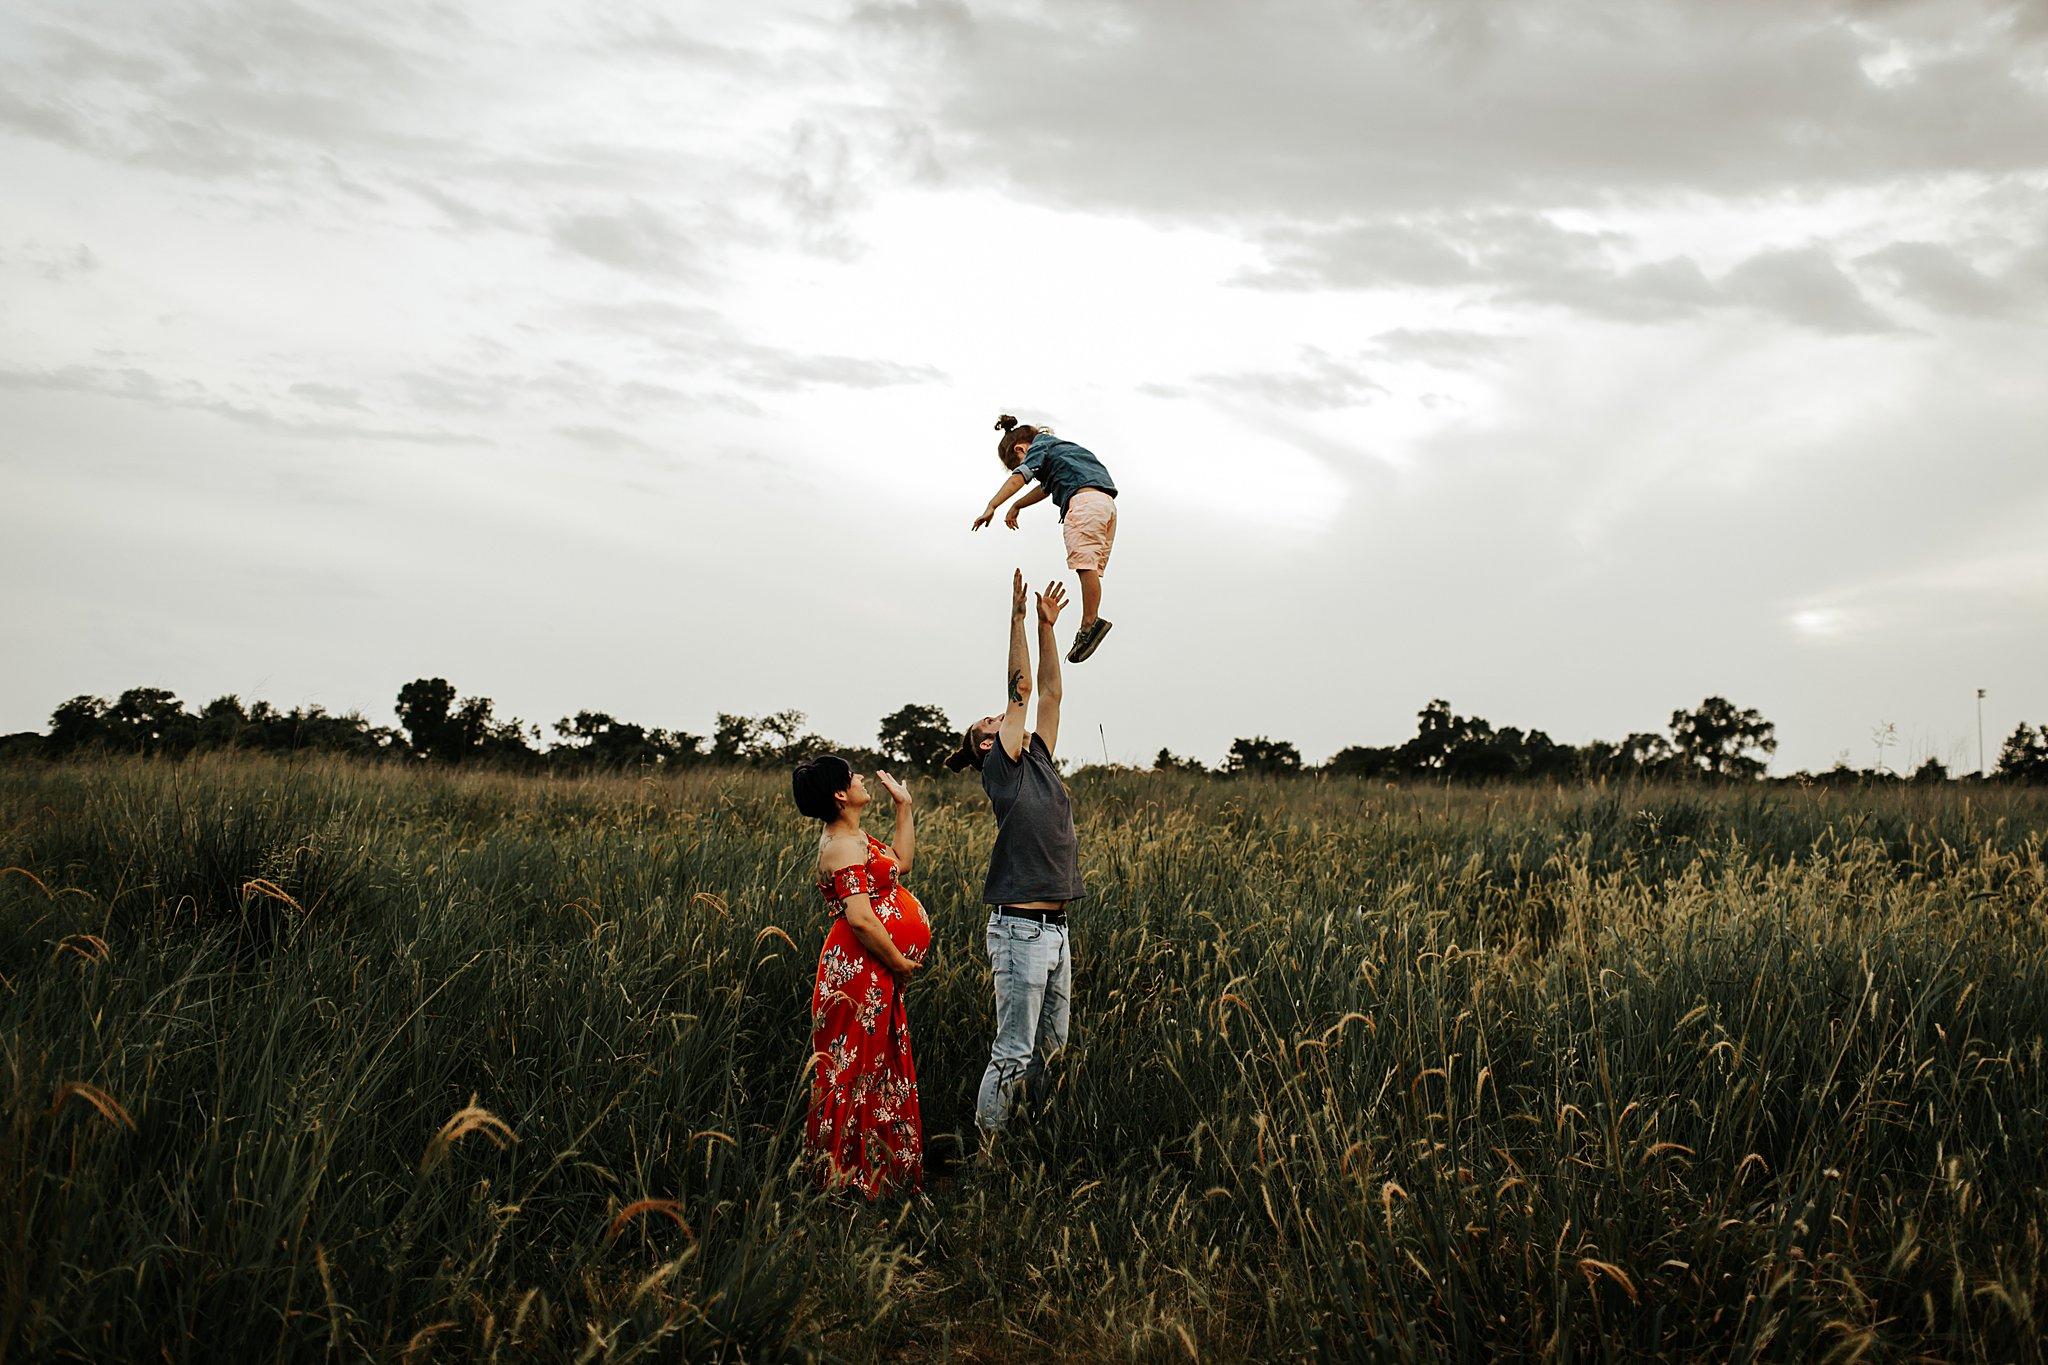 Meagan-San-Antonio-Maternity-Photographer-58_WEB.jpg